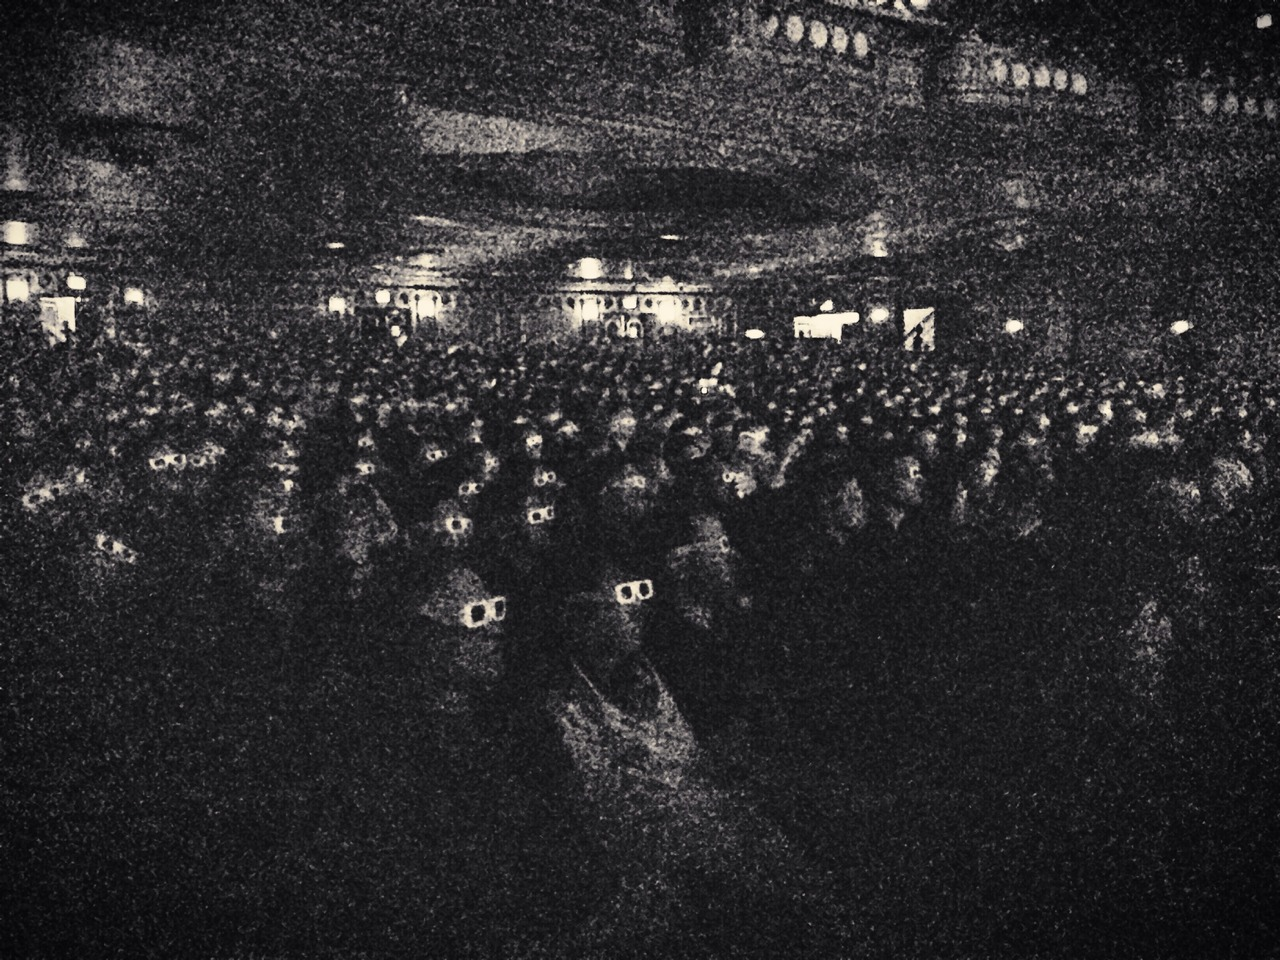 berniedechant: Kraftwerk United Palace Theater NYC